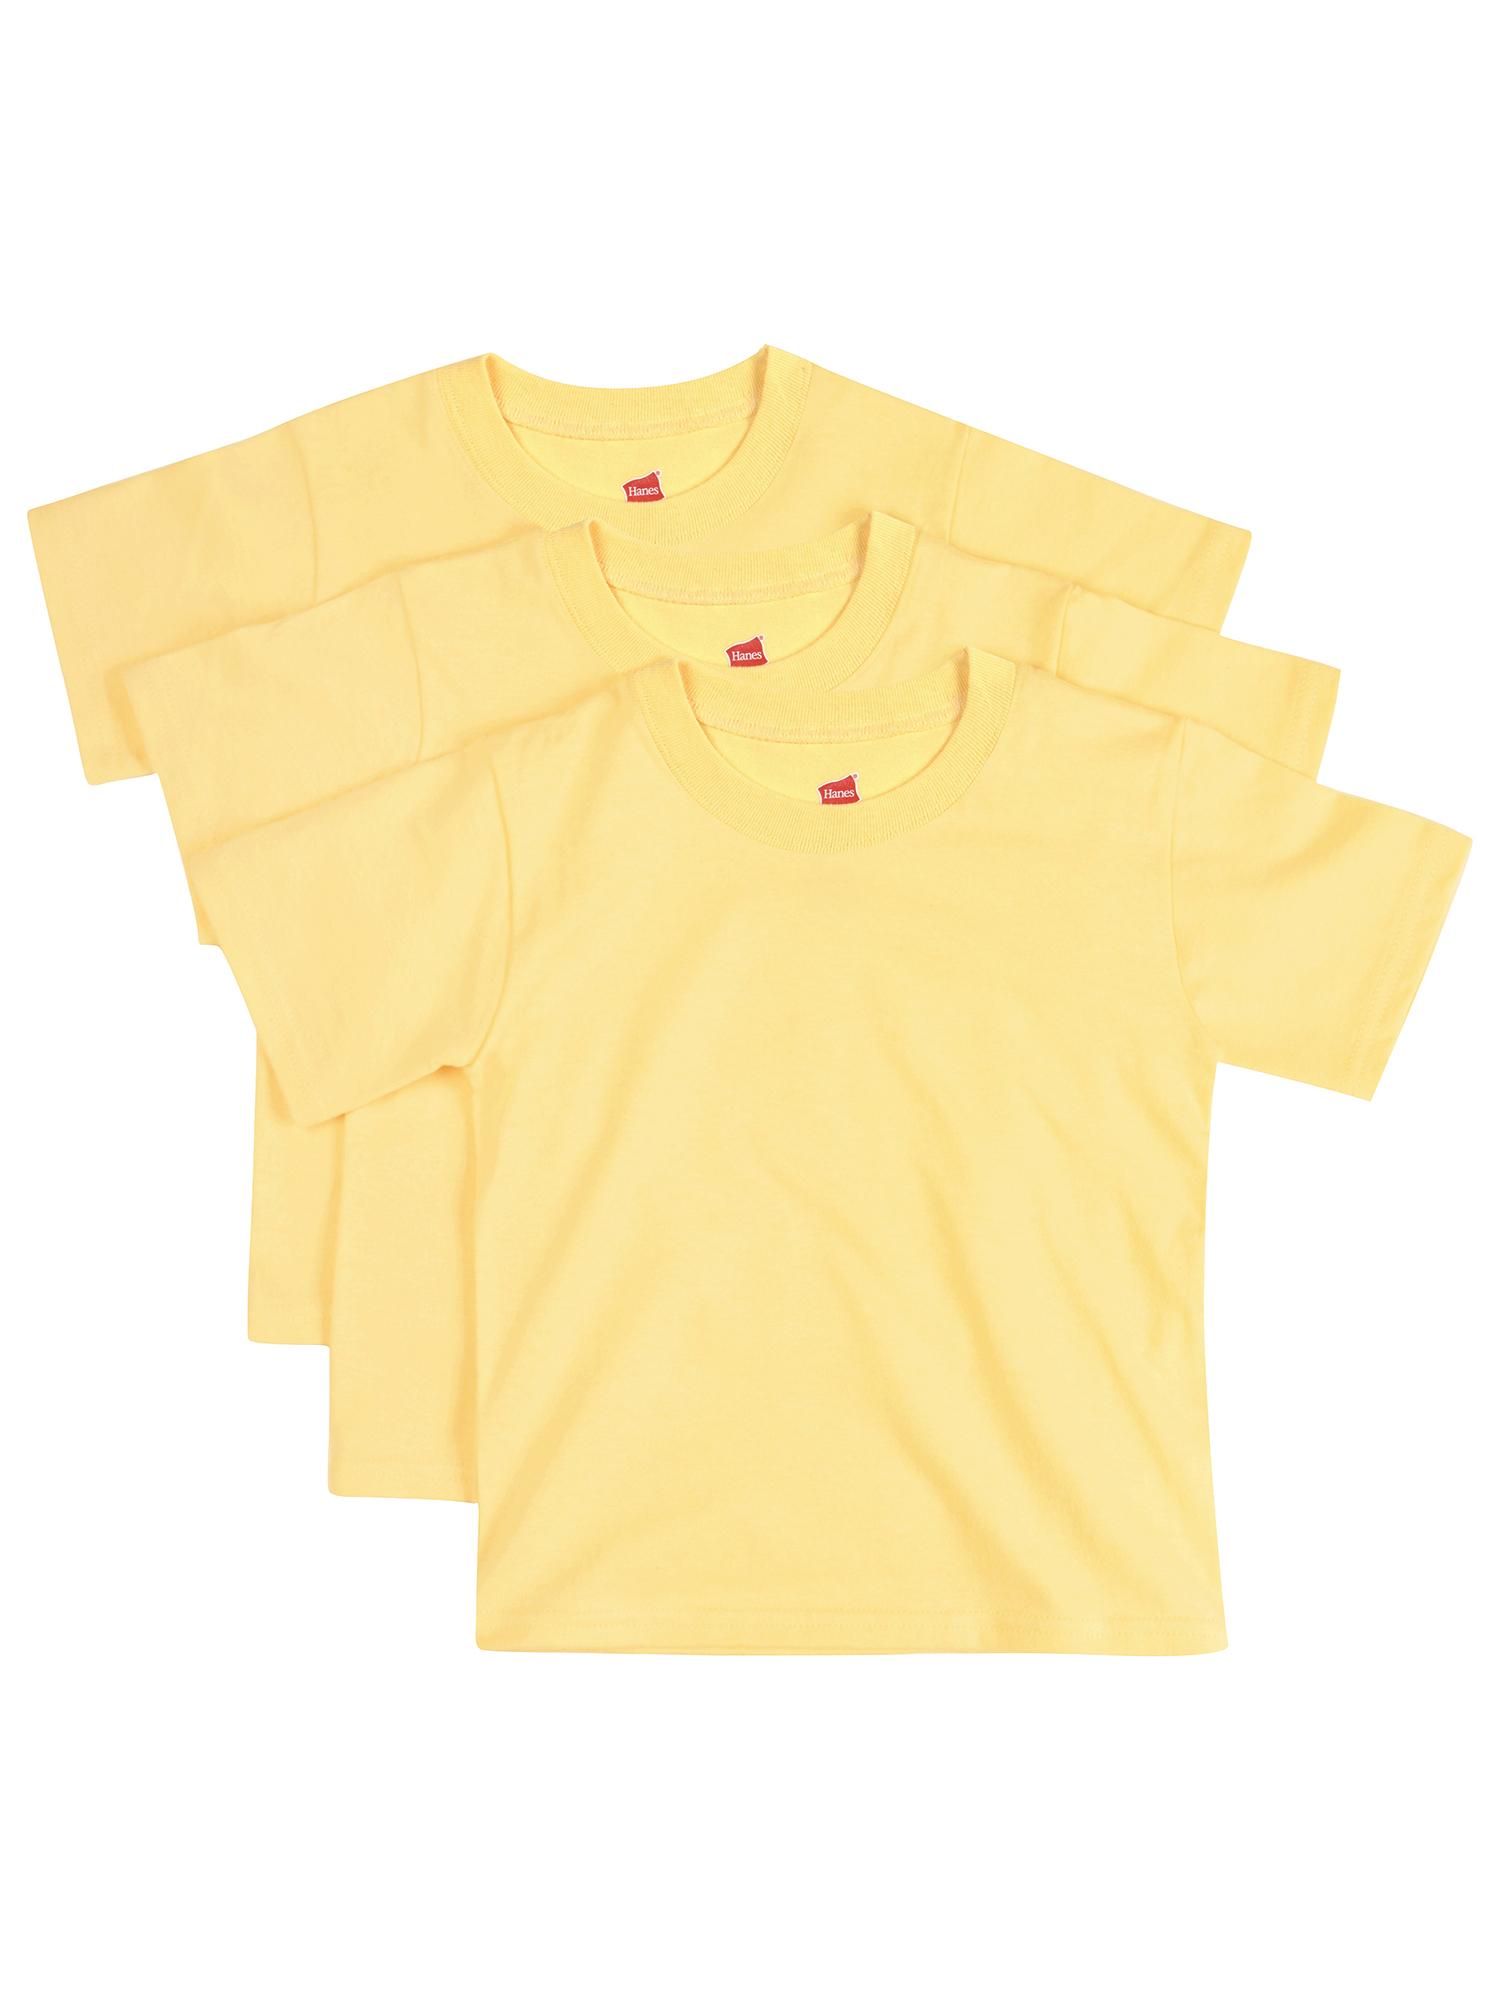 Baby Toddler Short Sleeve Tee - 3-pack